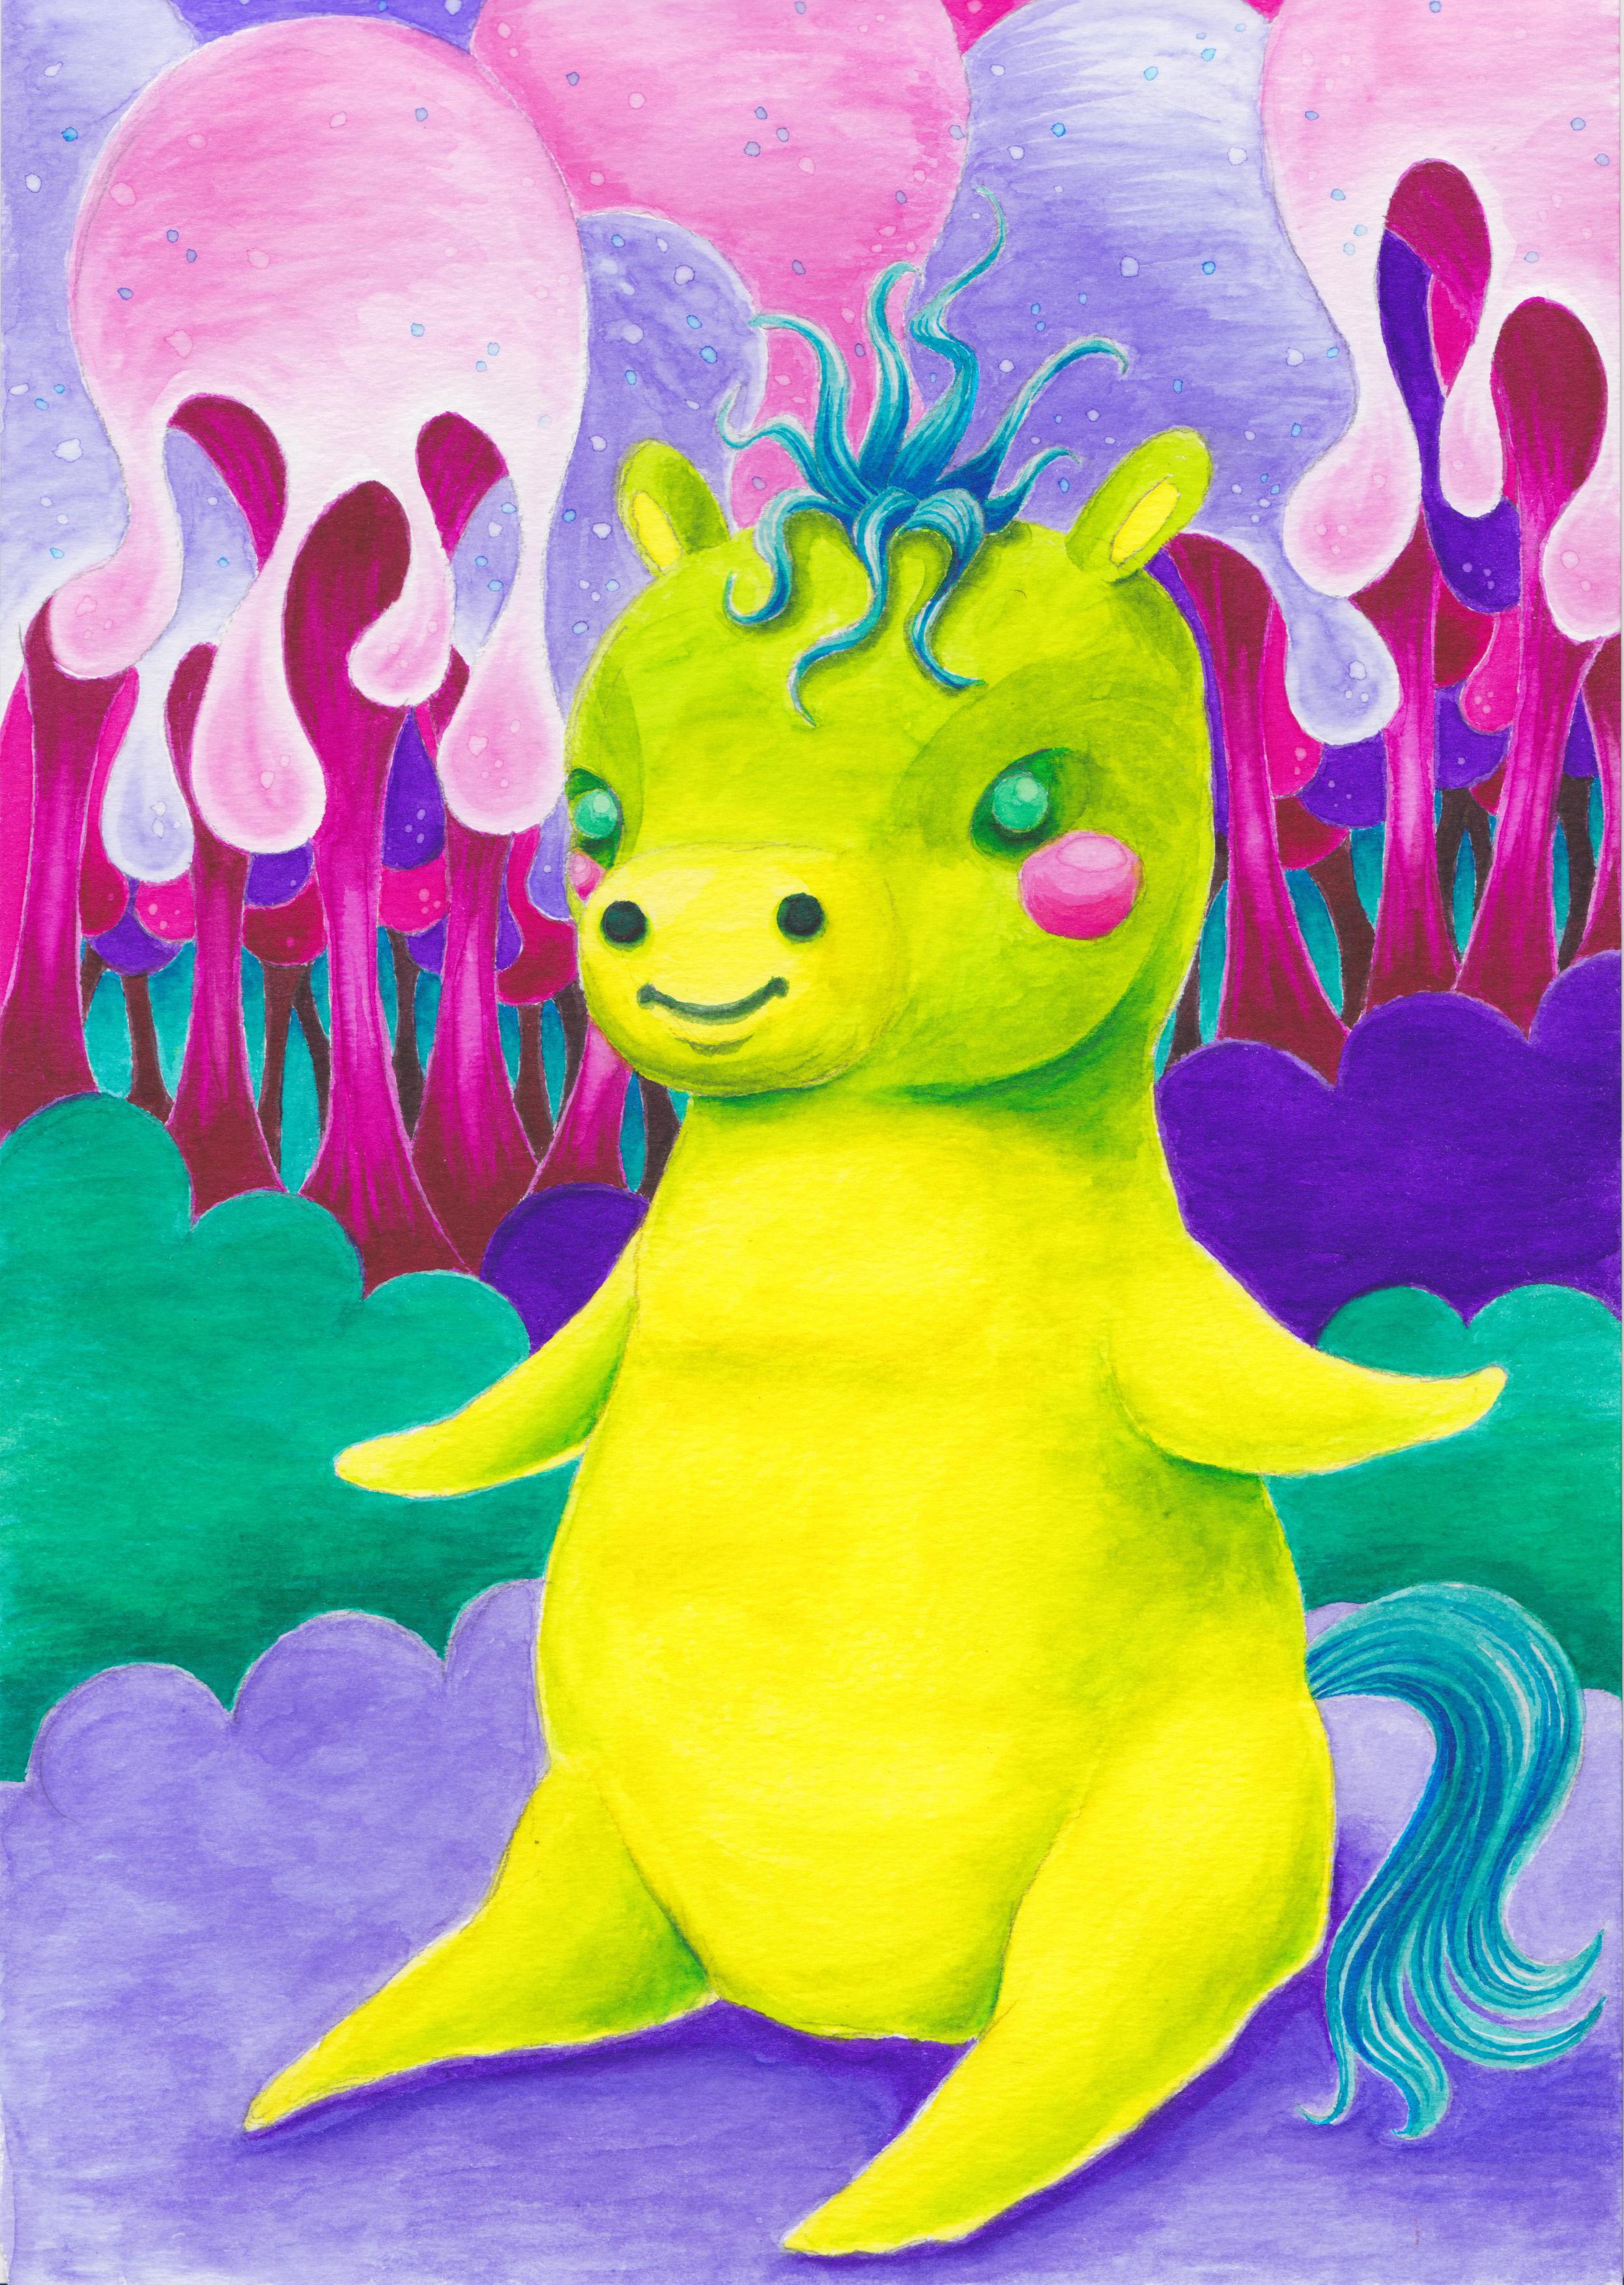 Lil' Green Pony